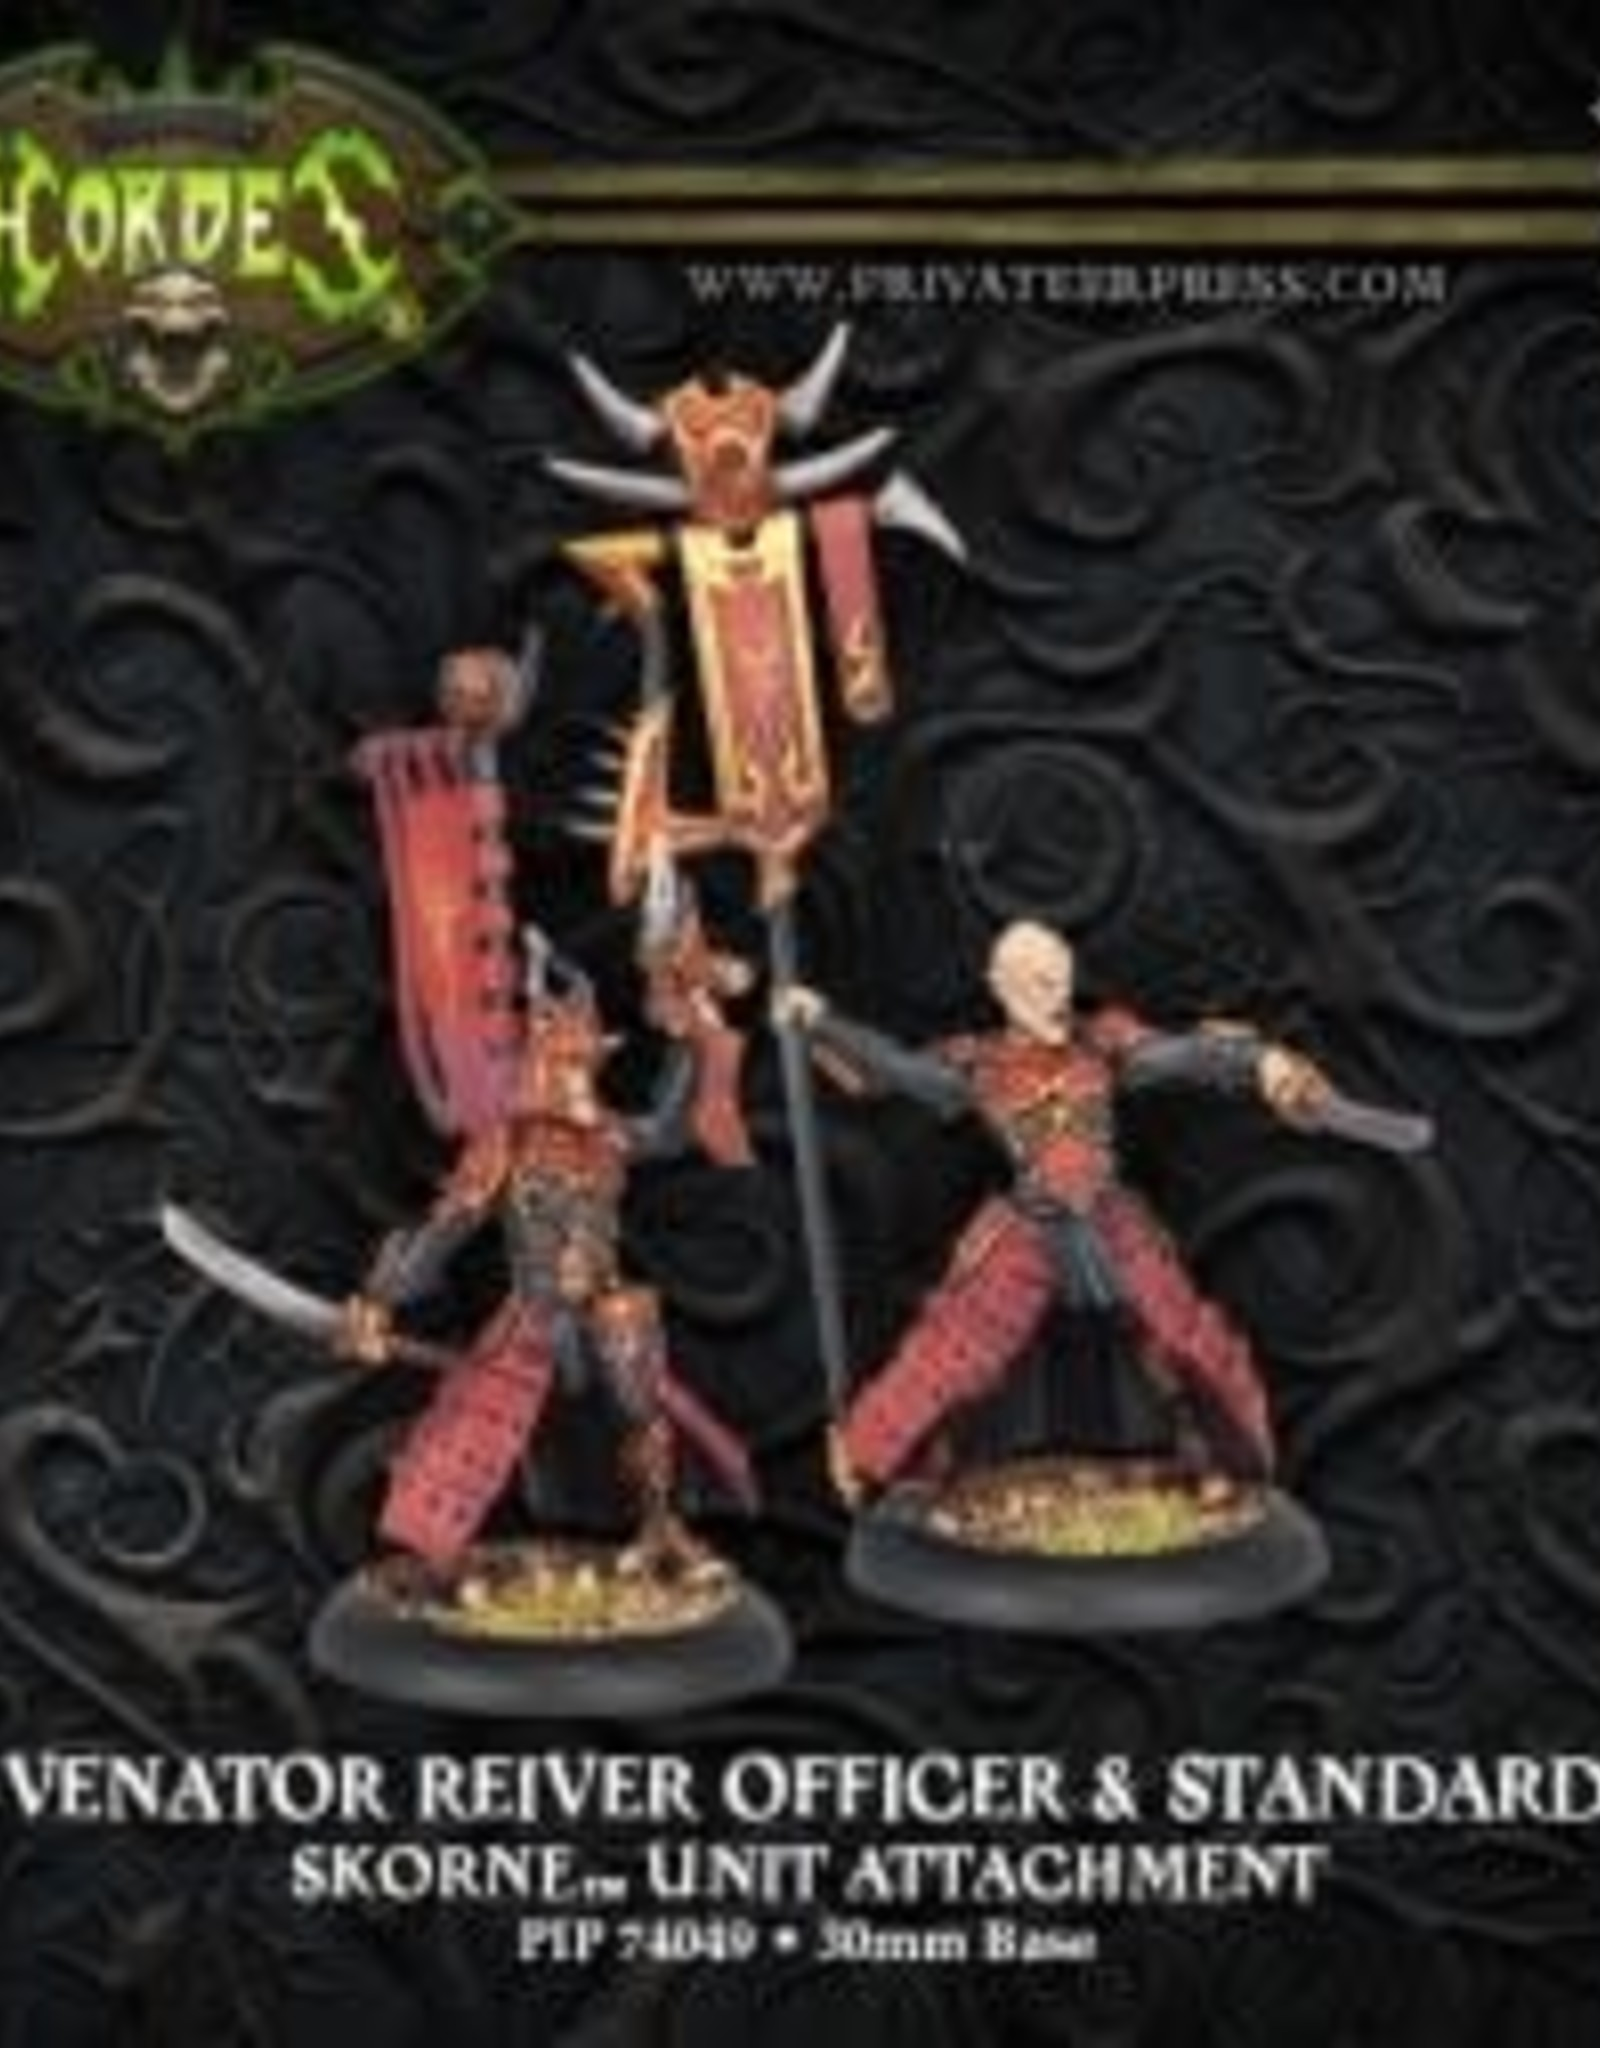 Hordes Skorne - Venator Reaver Officer & Standard